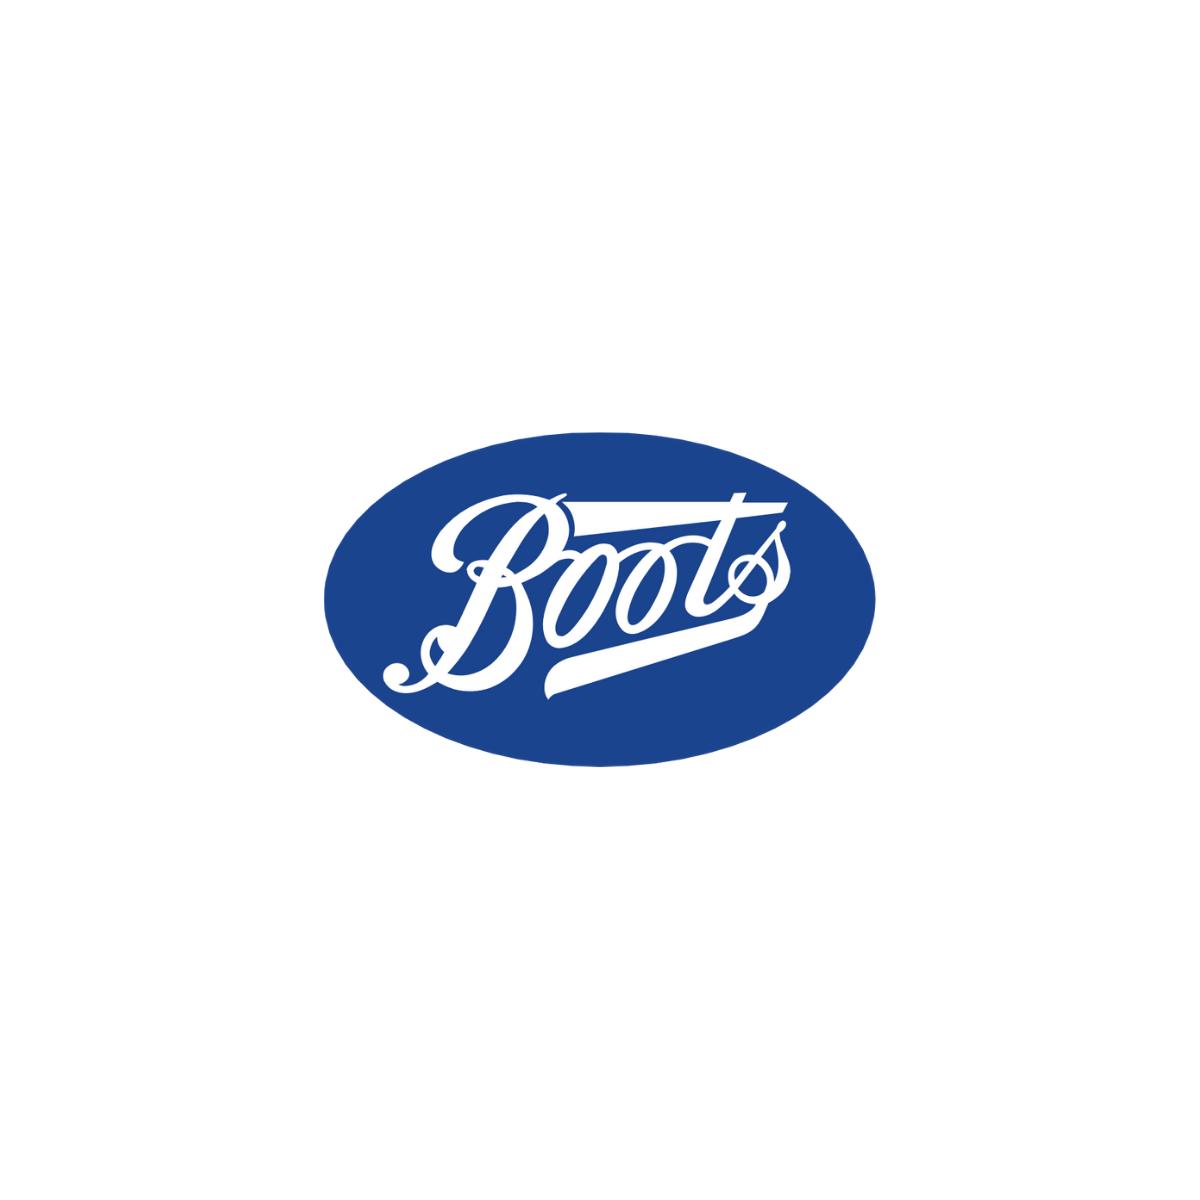 Books UK logo